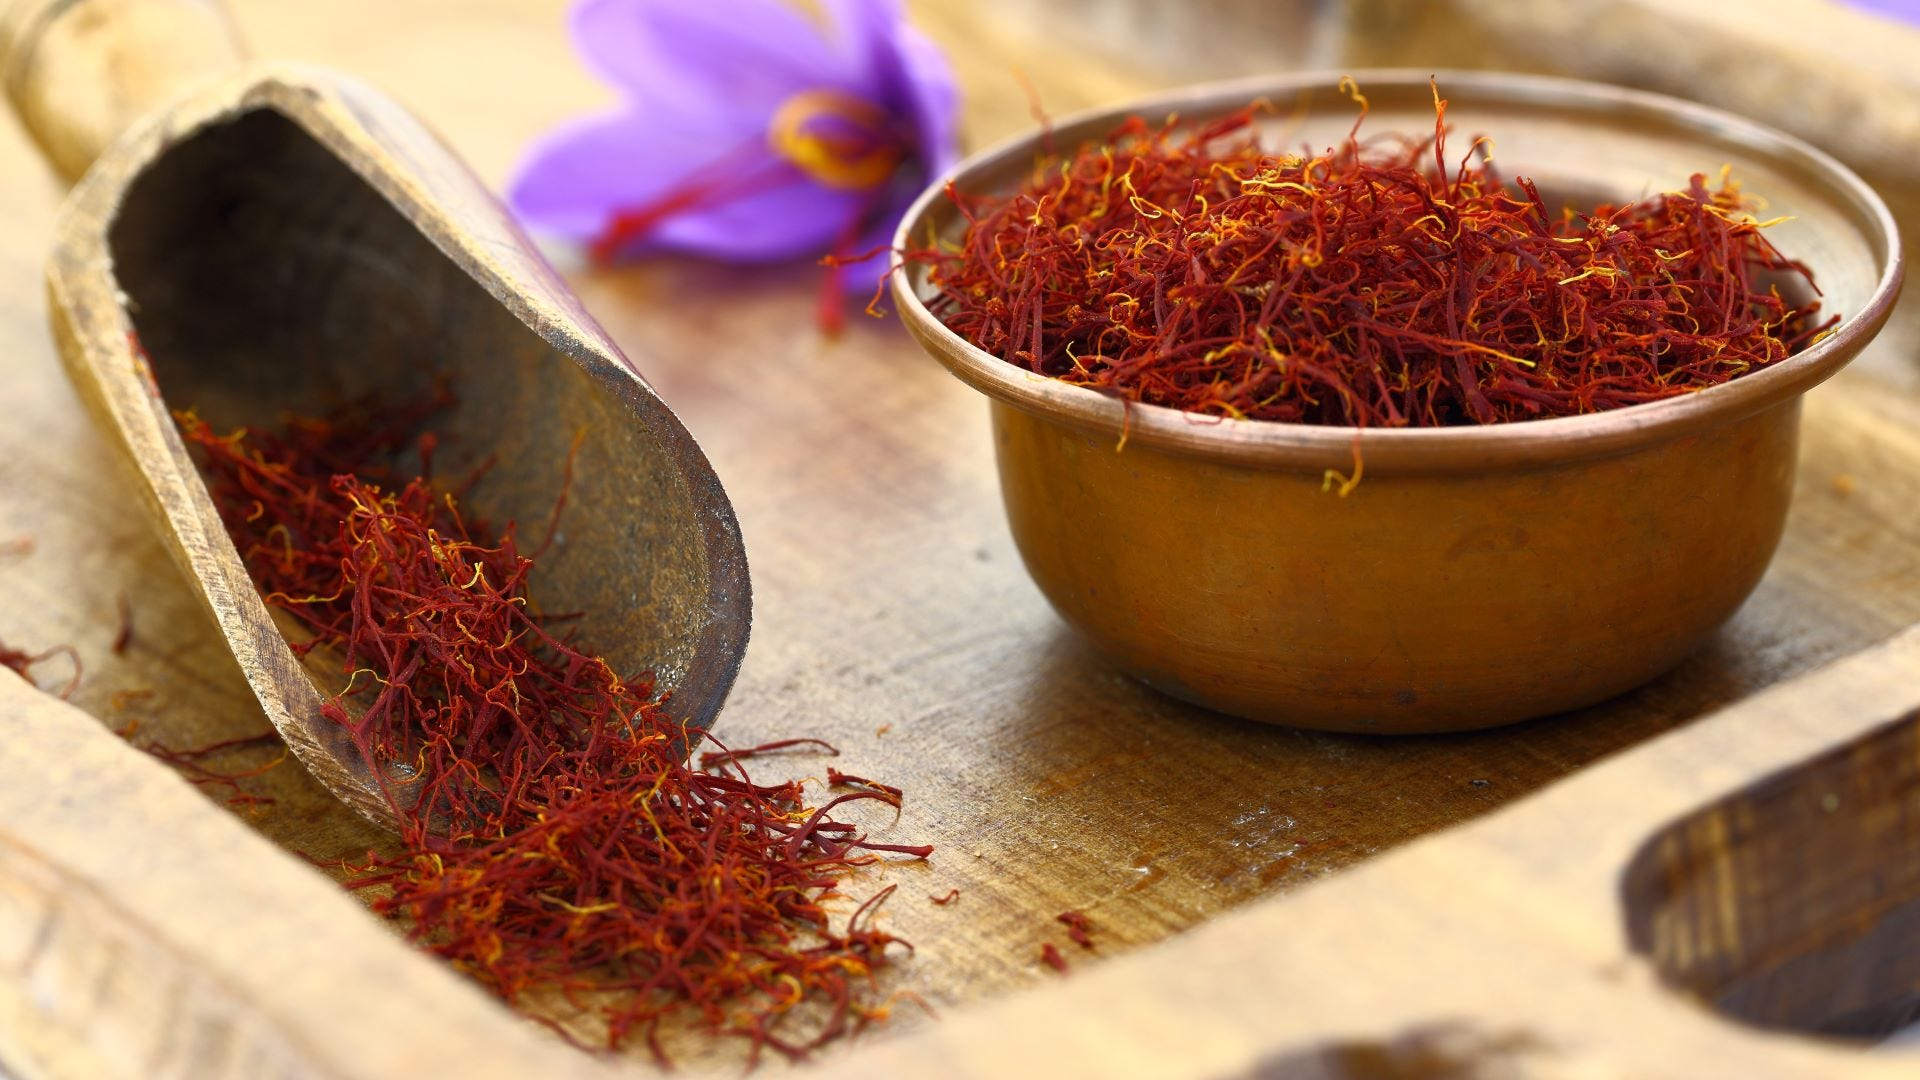 A bowl and scooper full of saffron next to a saffron flower.